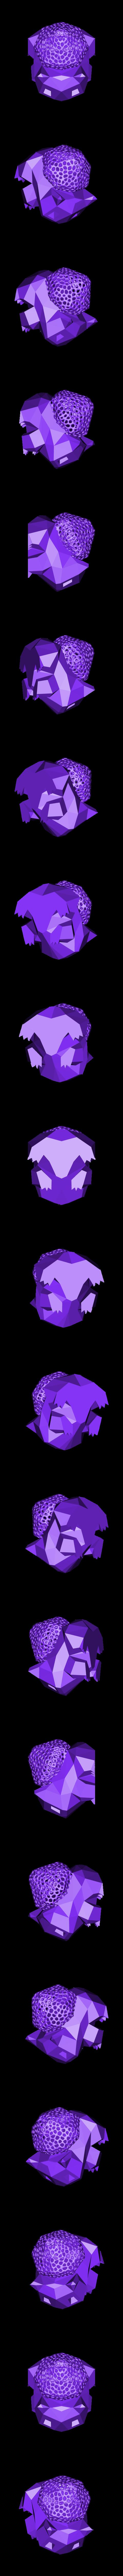 Grand_Elzing_1.stl Download STL file Low Poly Voronoi Hybrid Bulbasaur • 3D printer model, 3DPrintingGurus